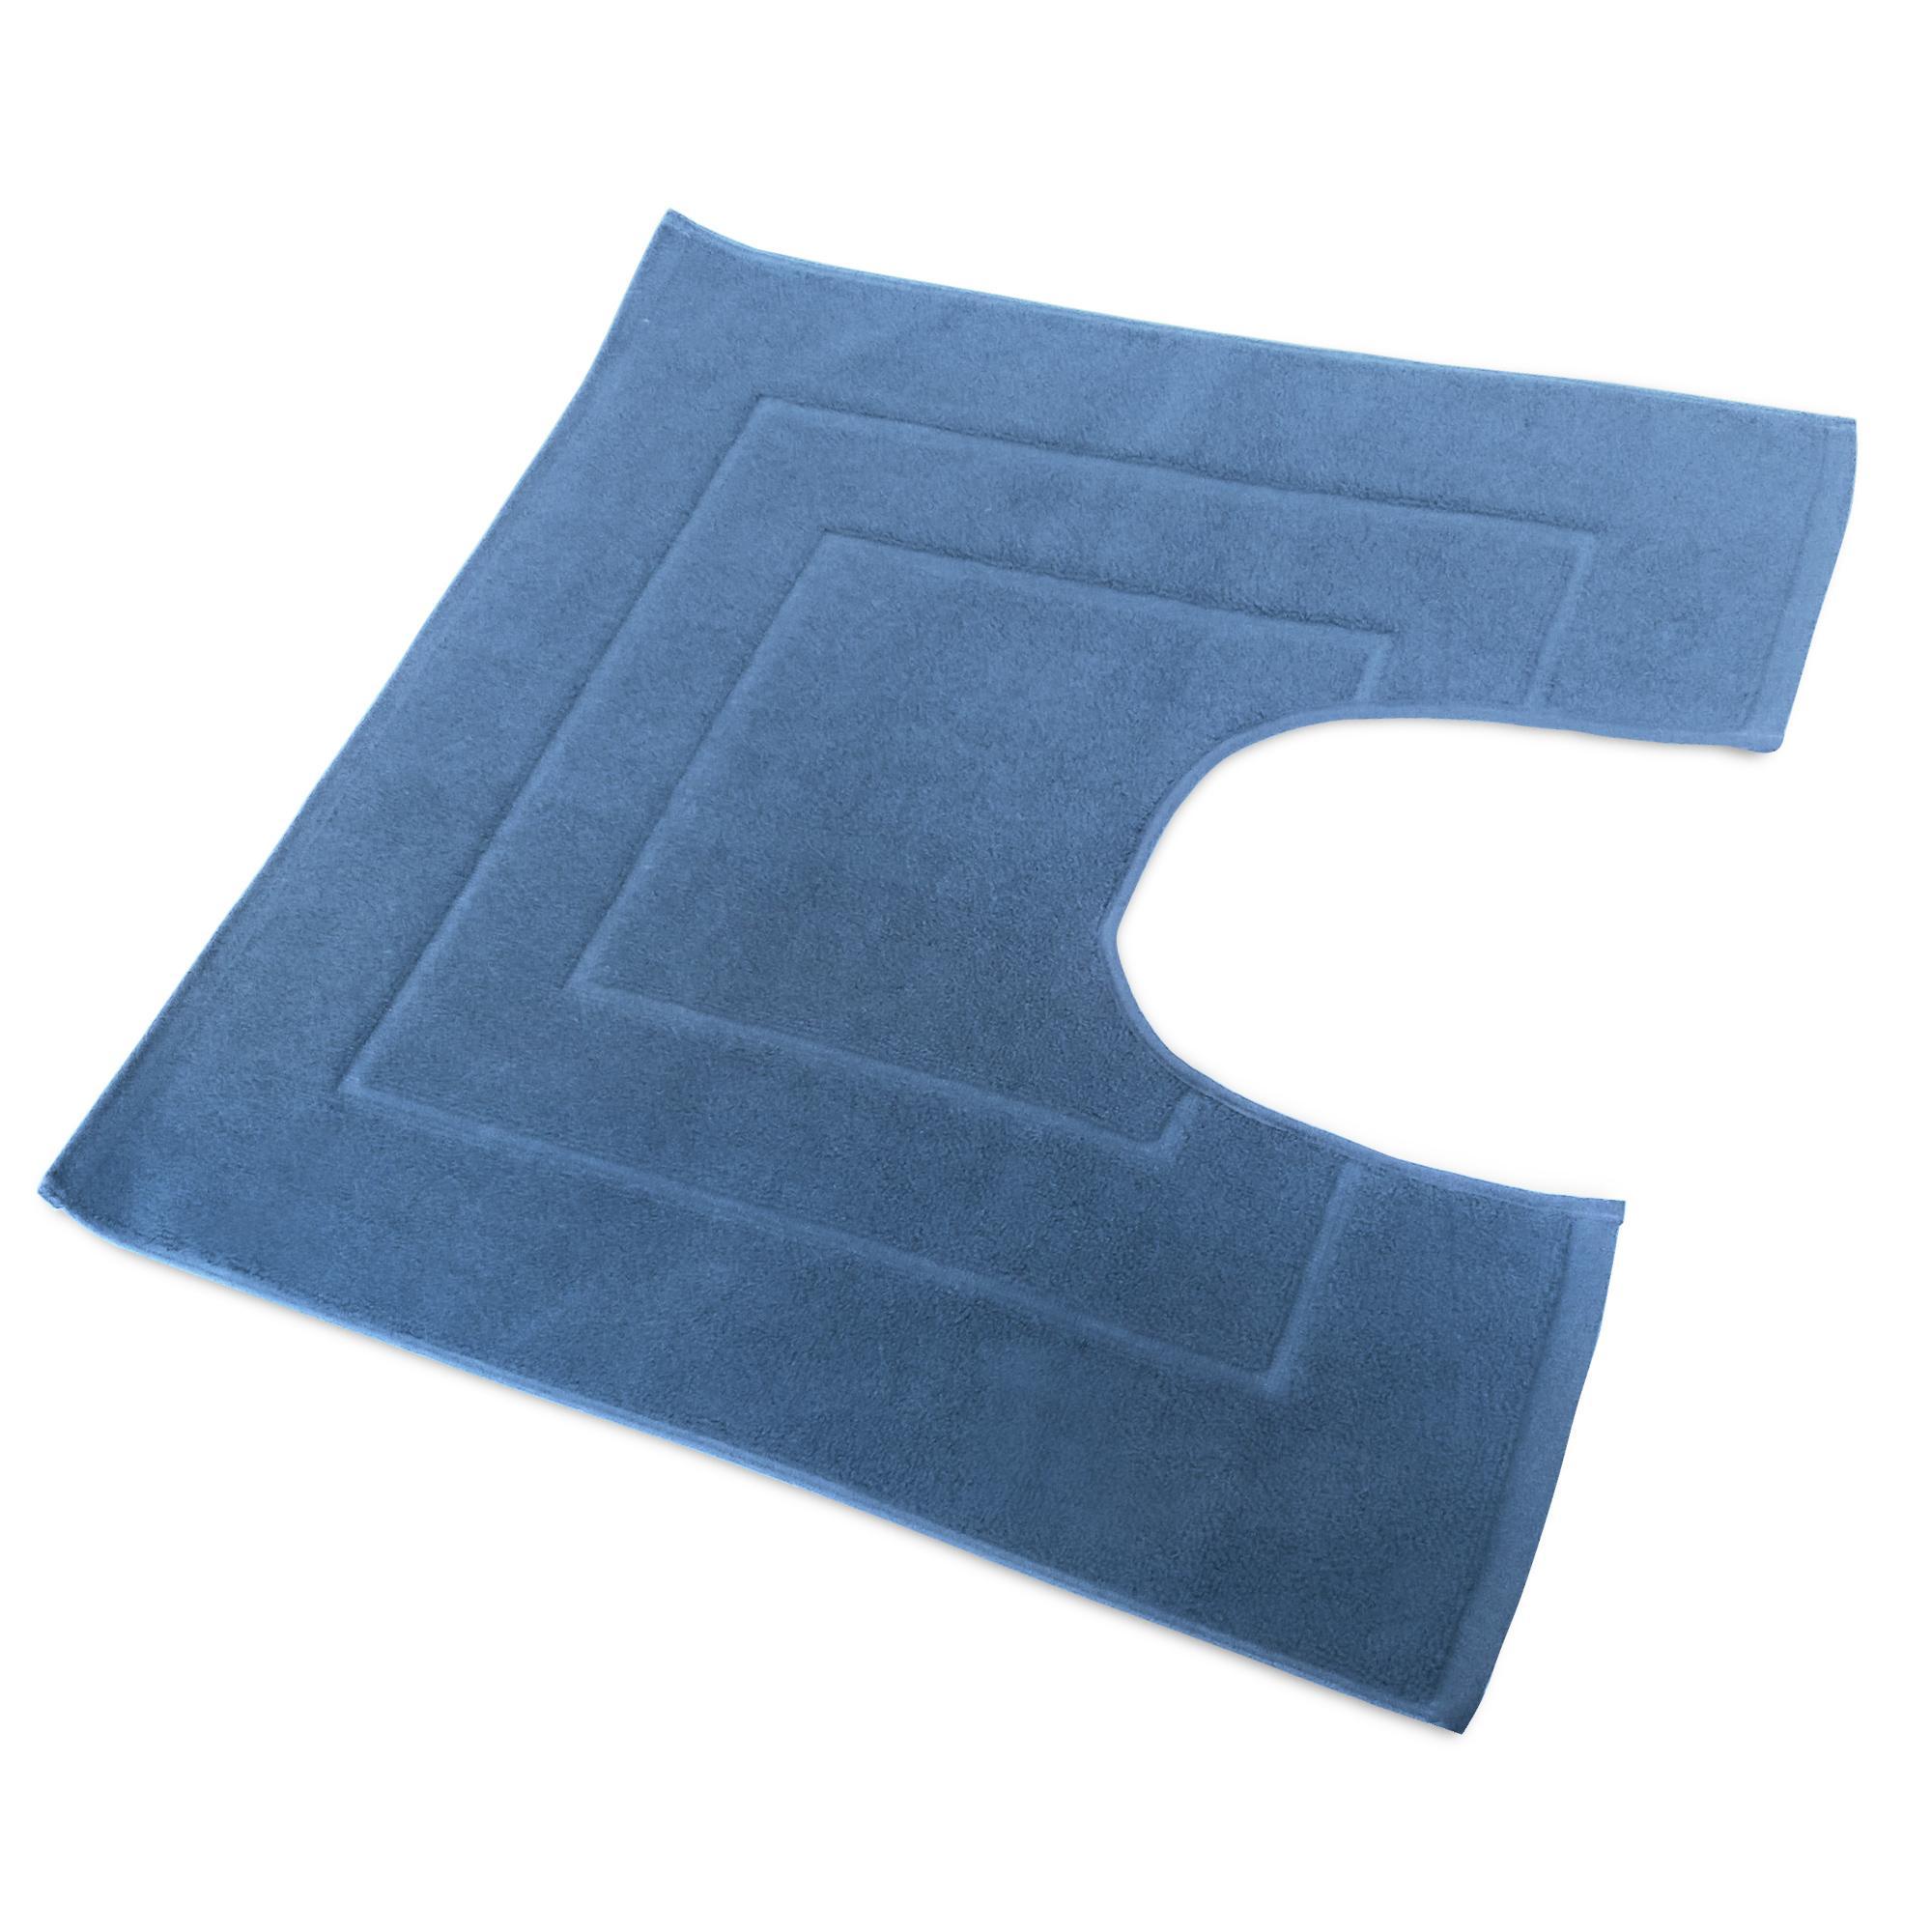 Tapis De Bain Contour Wc 60x60cm Uni Coton Flair Bleu Moyen Linnea